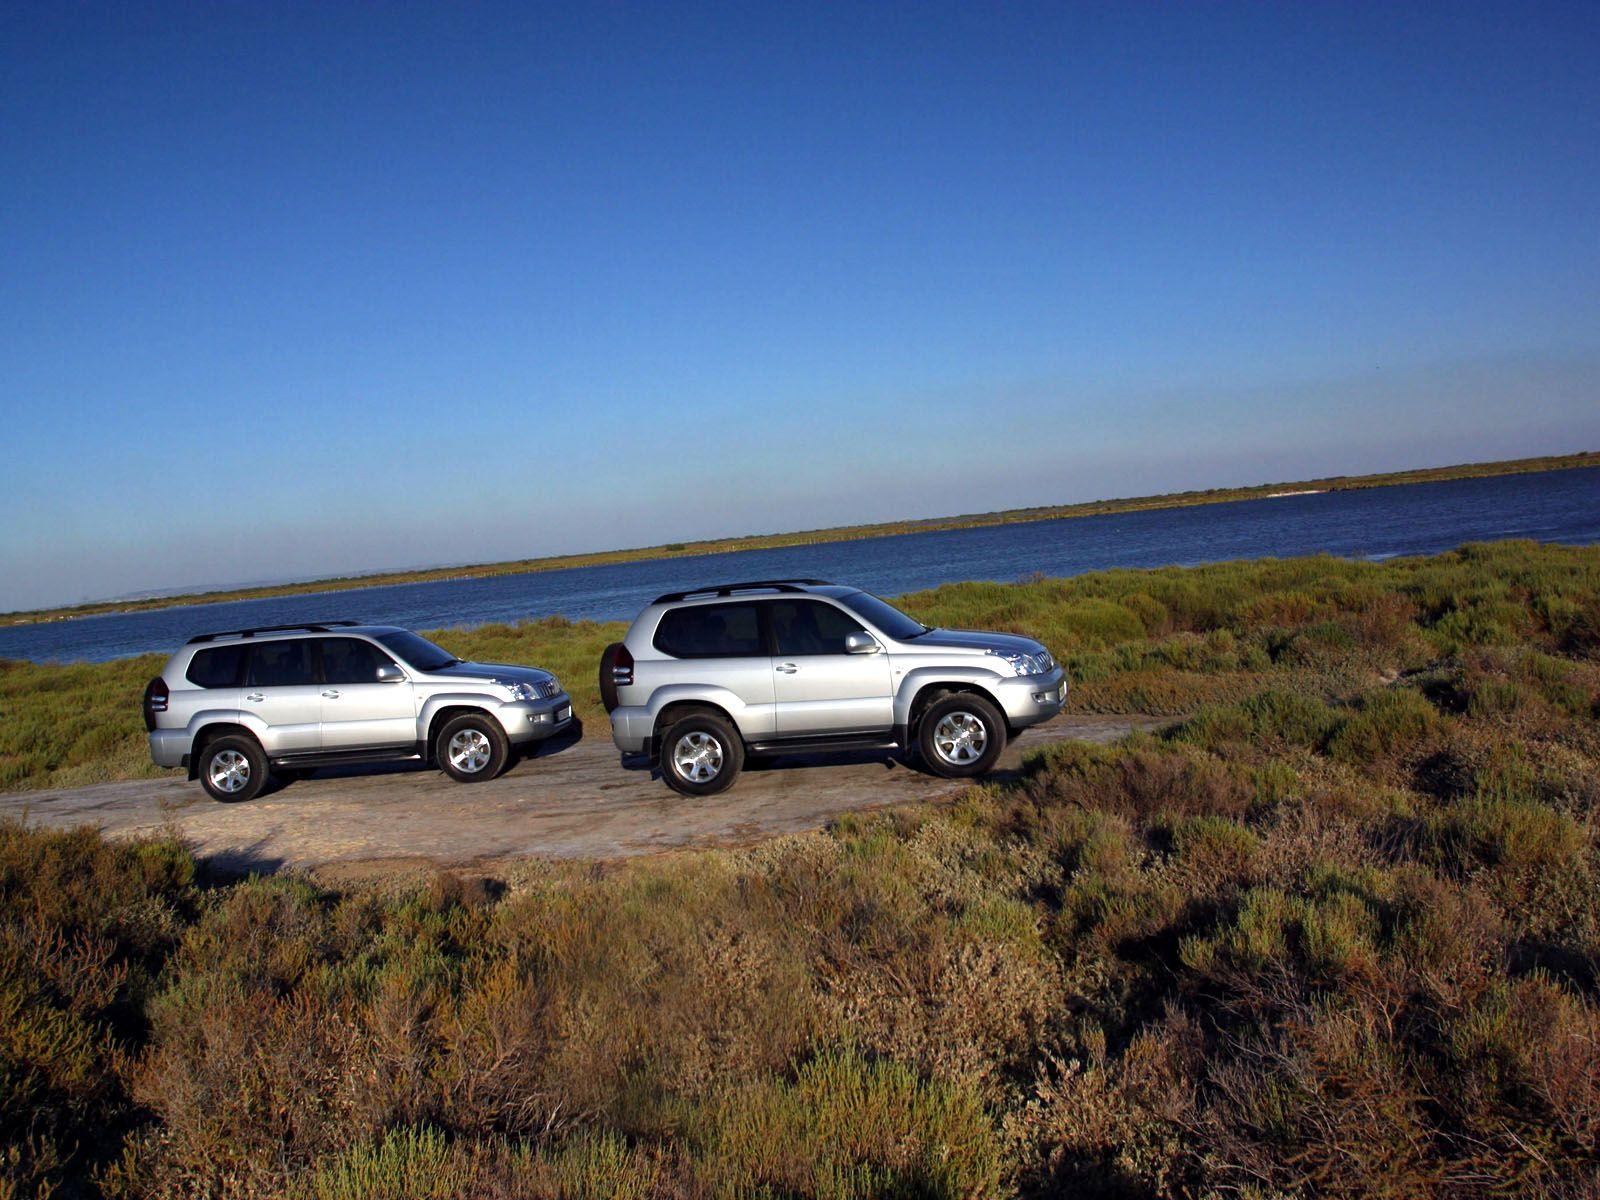 Toyota Land Cruiser Prado 120 Photos Photogallery With